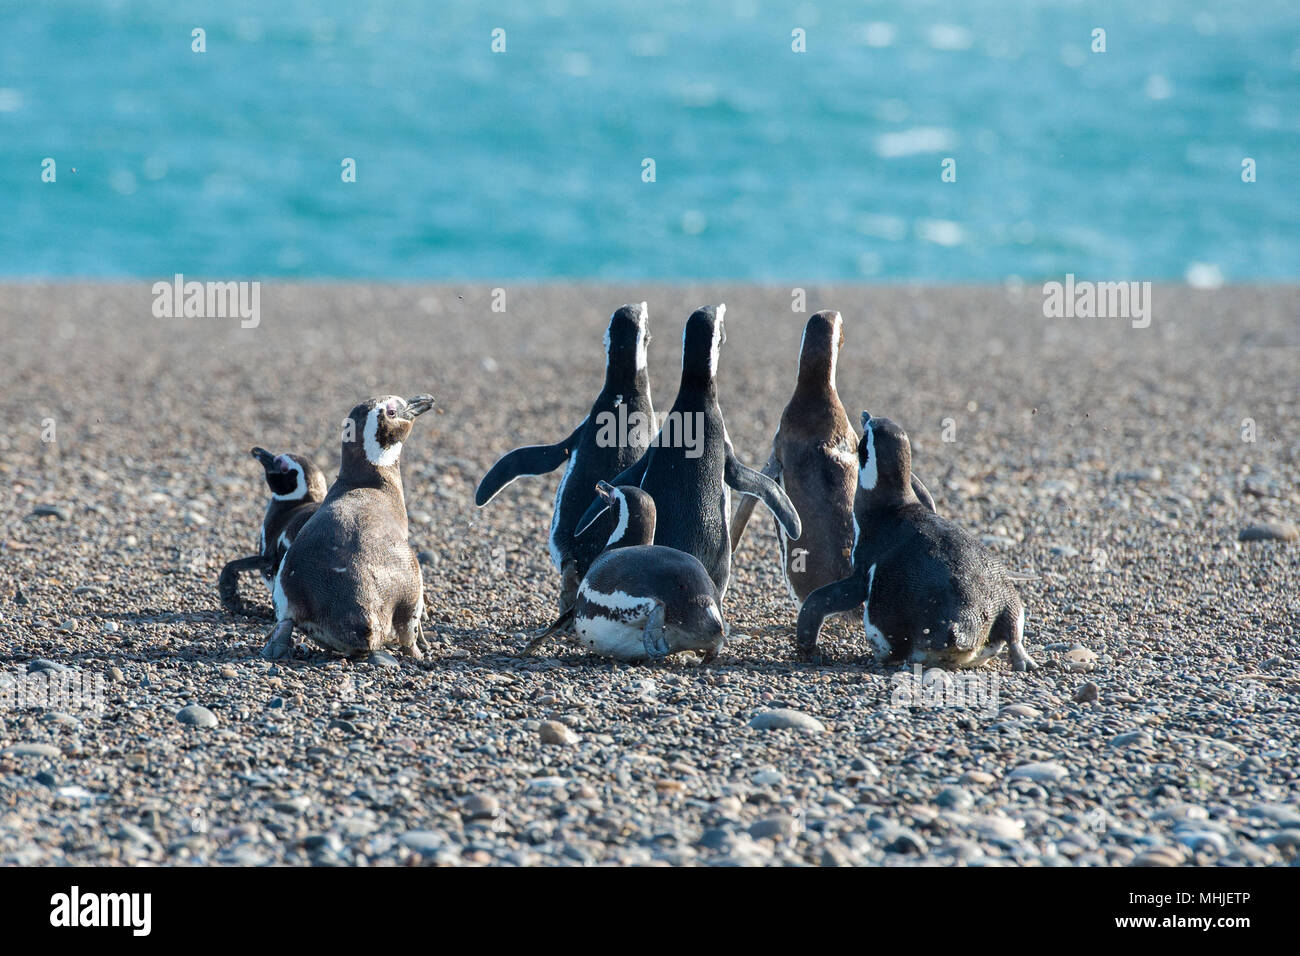 Patagonien pinguin Gruppe beim Spaziergang am Strand Stockfoto